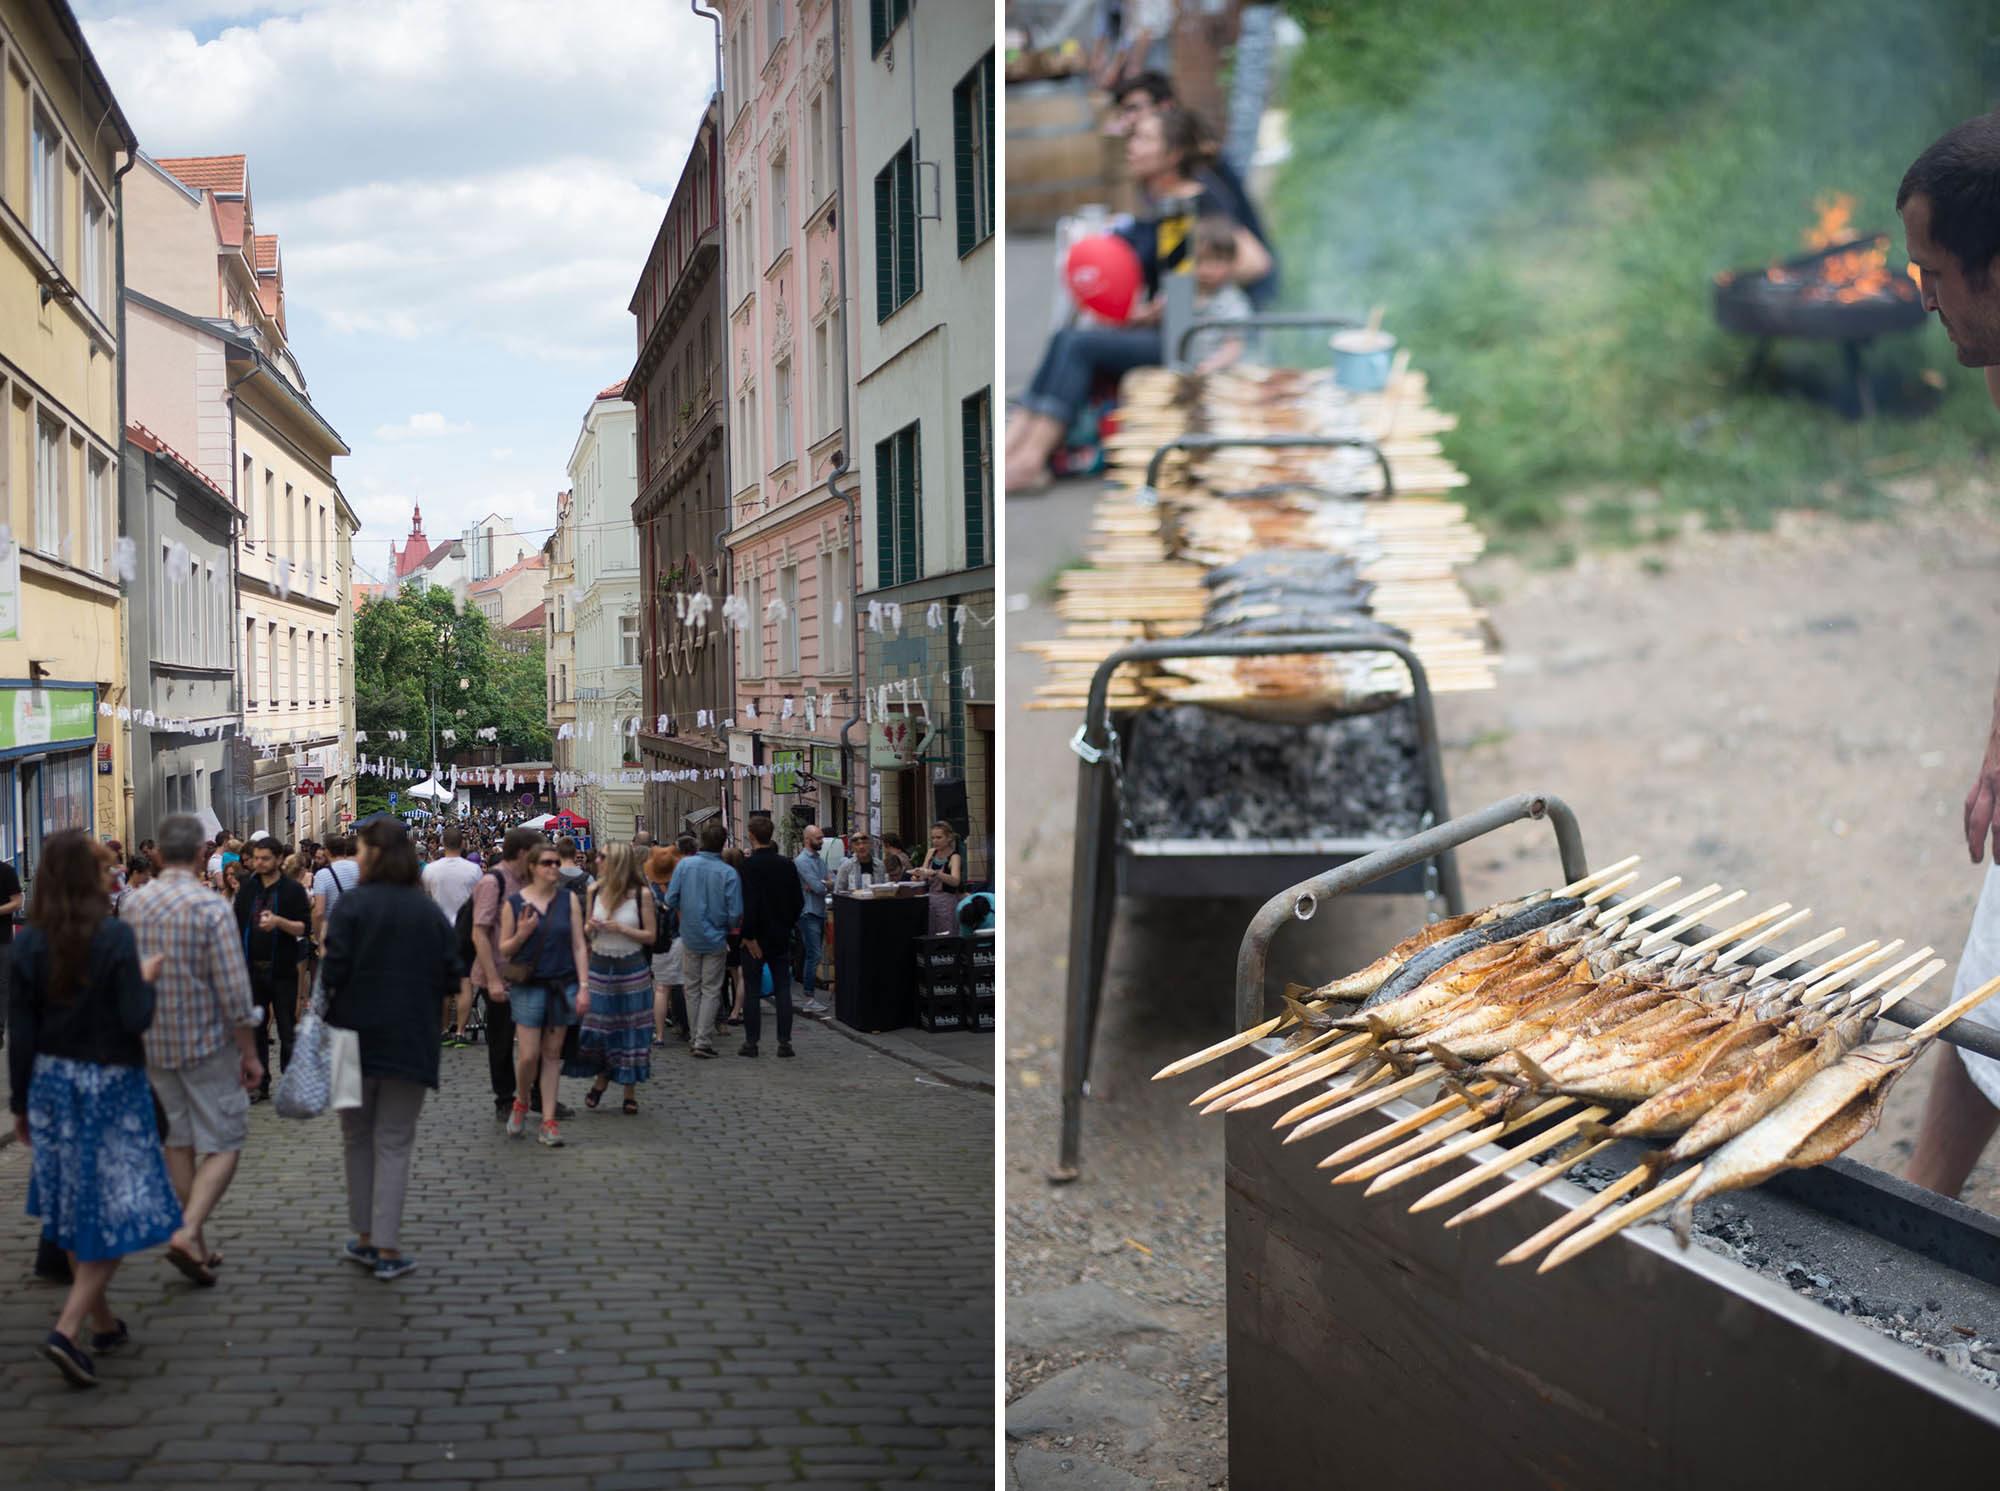 krymska street festival prague 2